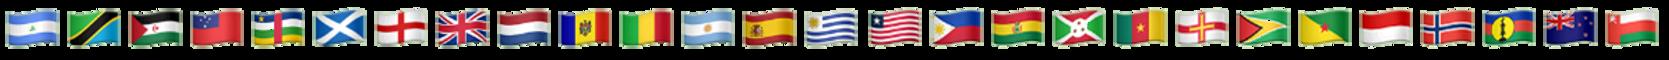 BanderasPaises.png